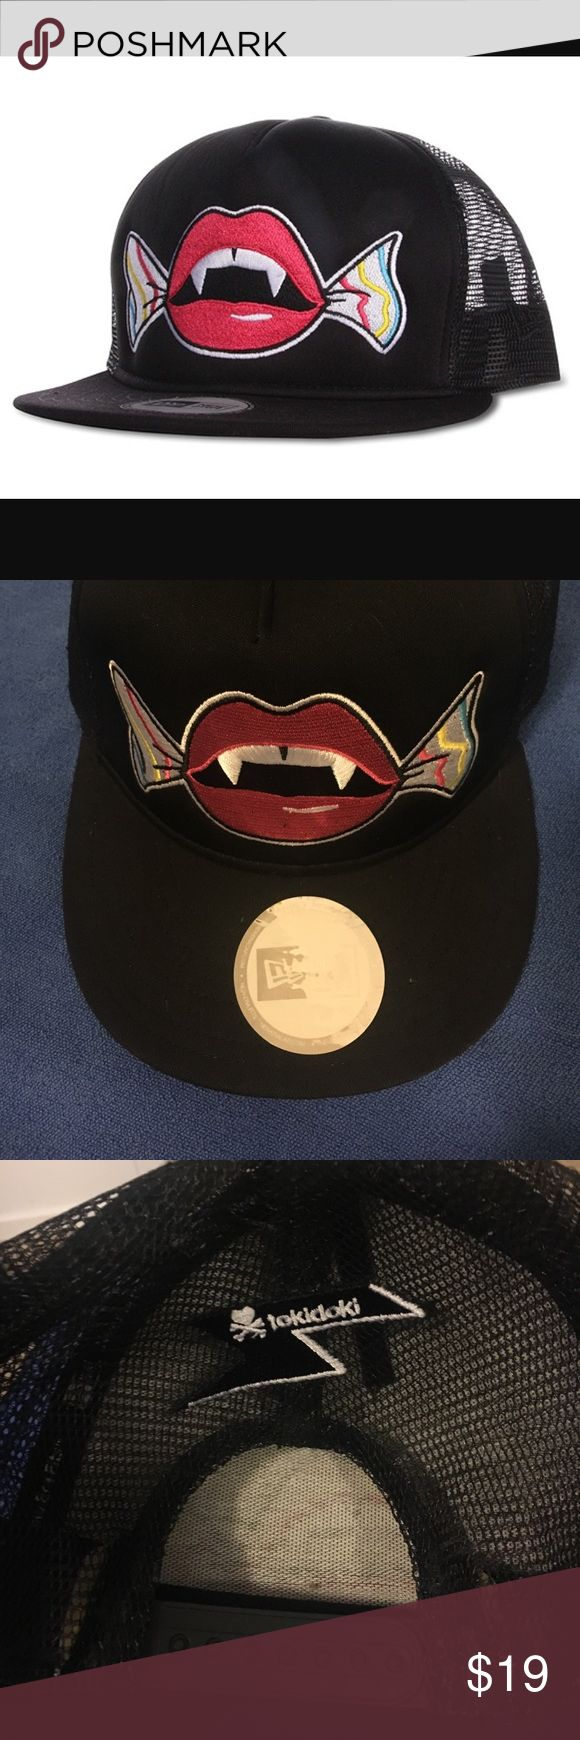 Tokidoki x New Era Candy Lips Snap back Snap Back hat with Tokidoki's Candy Lips image. Adjustable, one size fits all tokidoki Accessories Hats